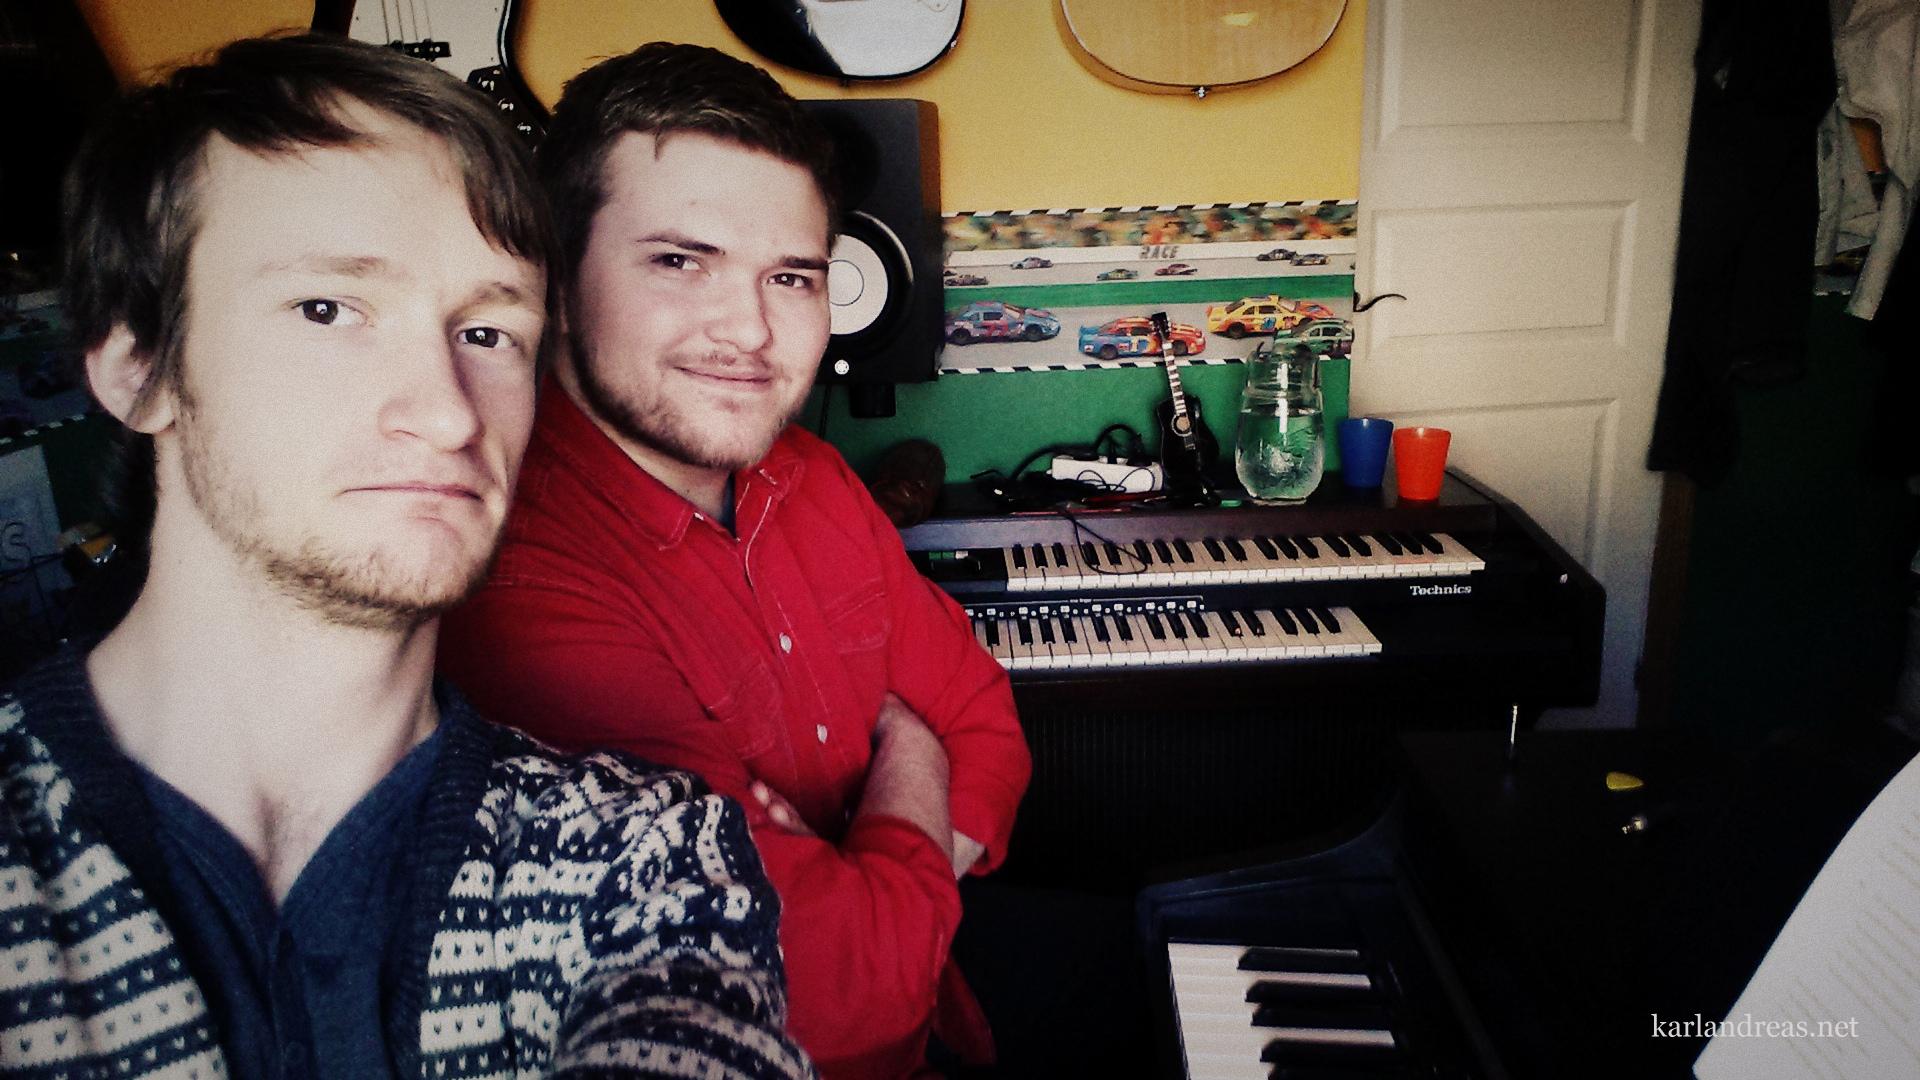 Olav & Karl Andreas - Studio i Olsvik 15